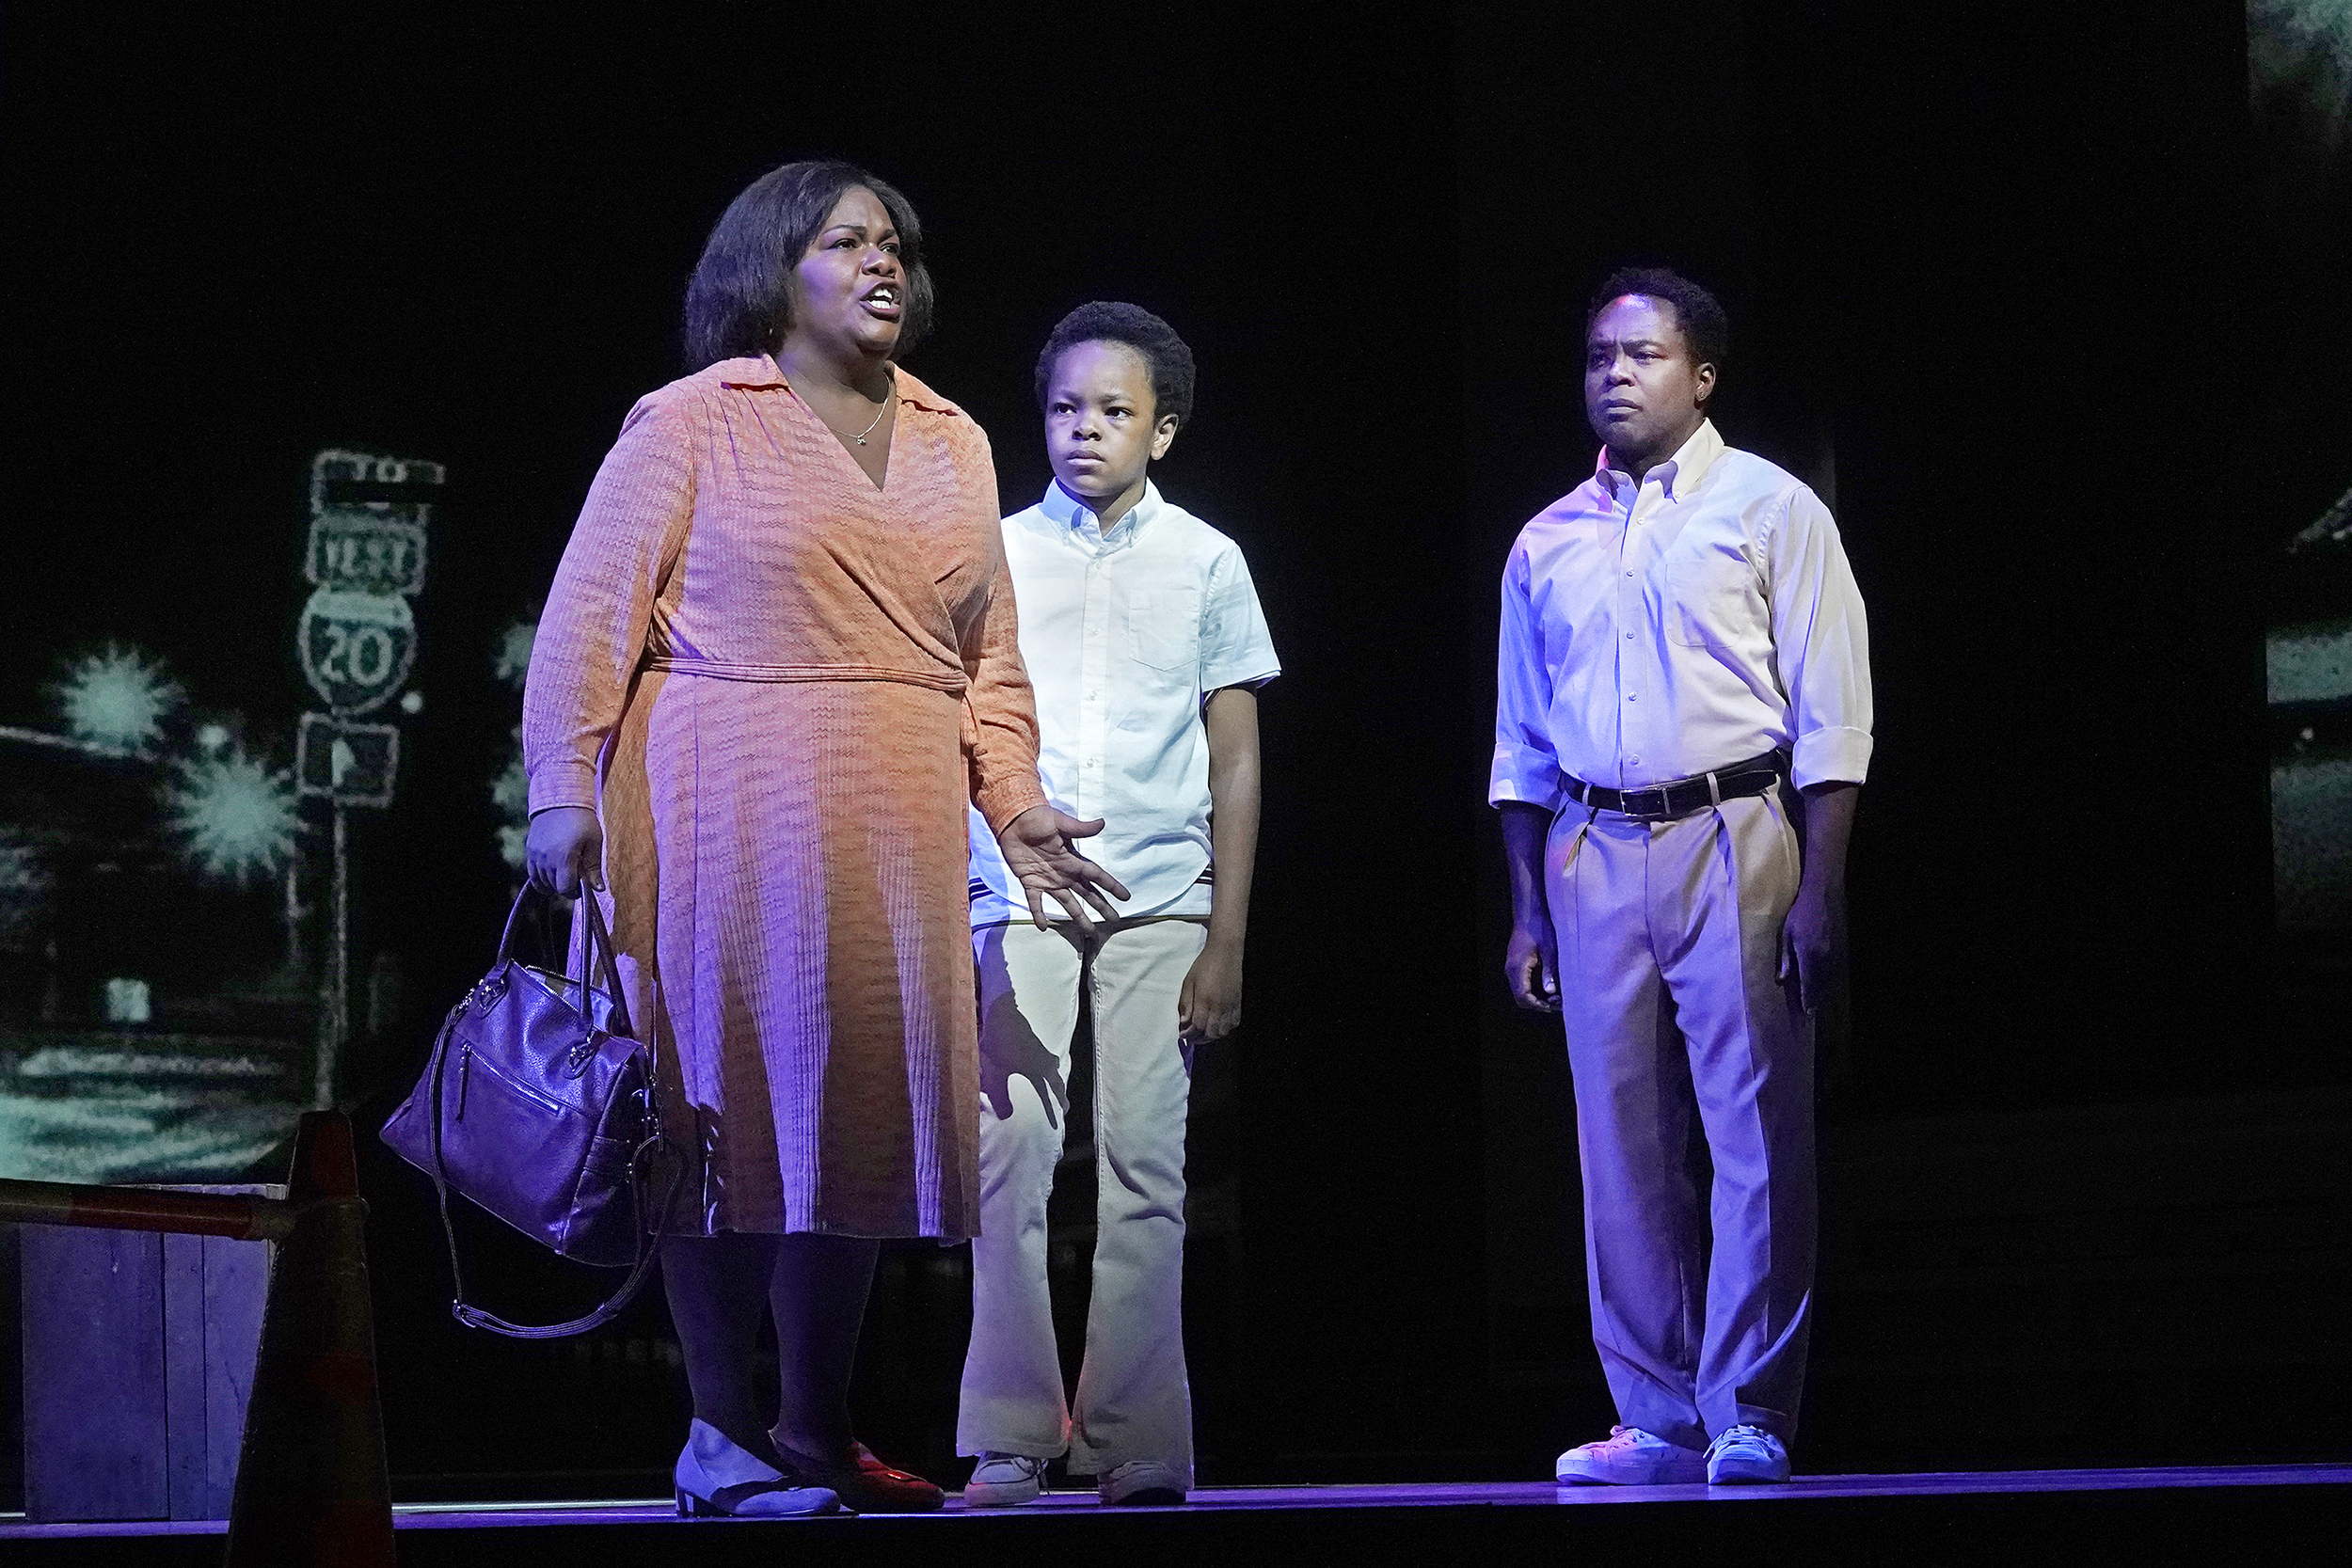 Metropolitan Opera season to open with first opera by Black composer